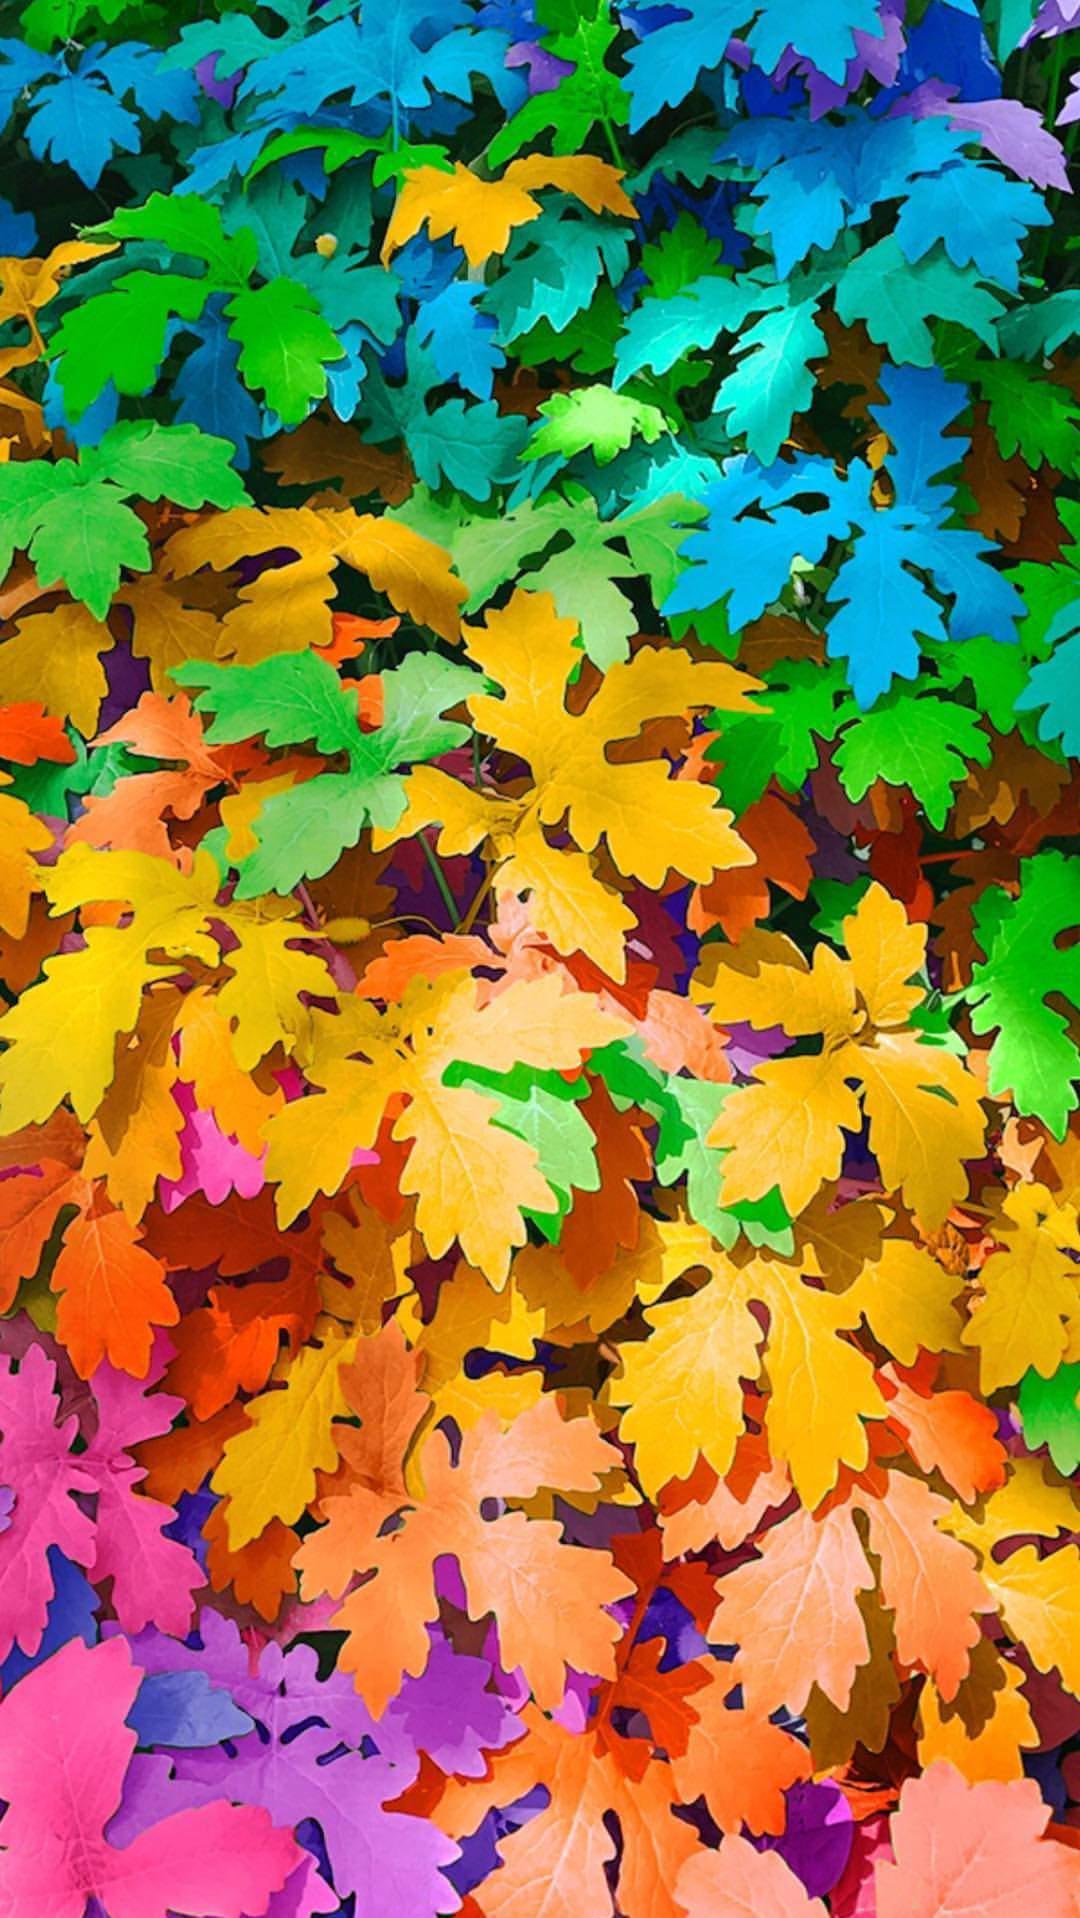 Colorful Autumn Plants iPhone Wallpaper